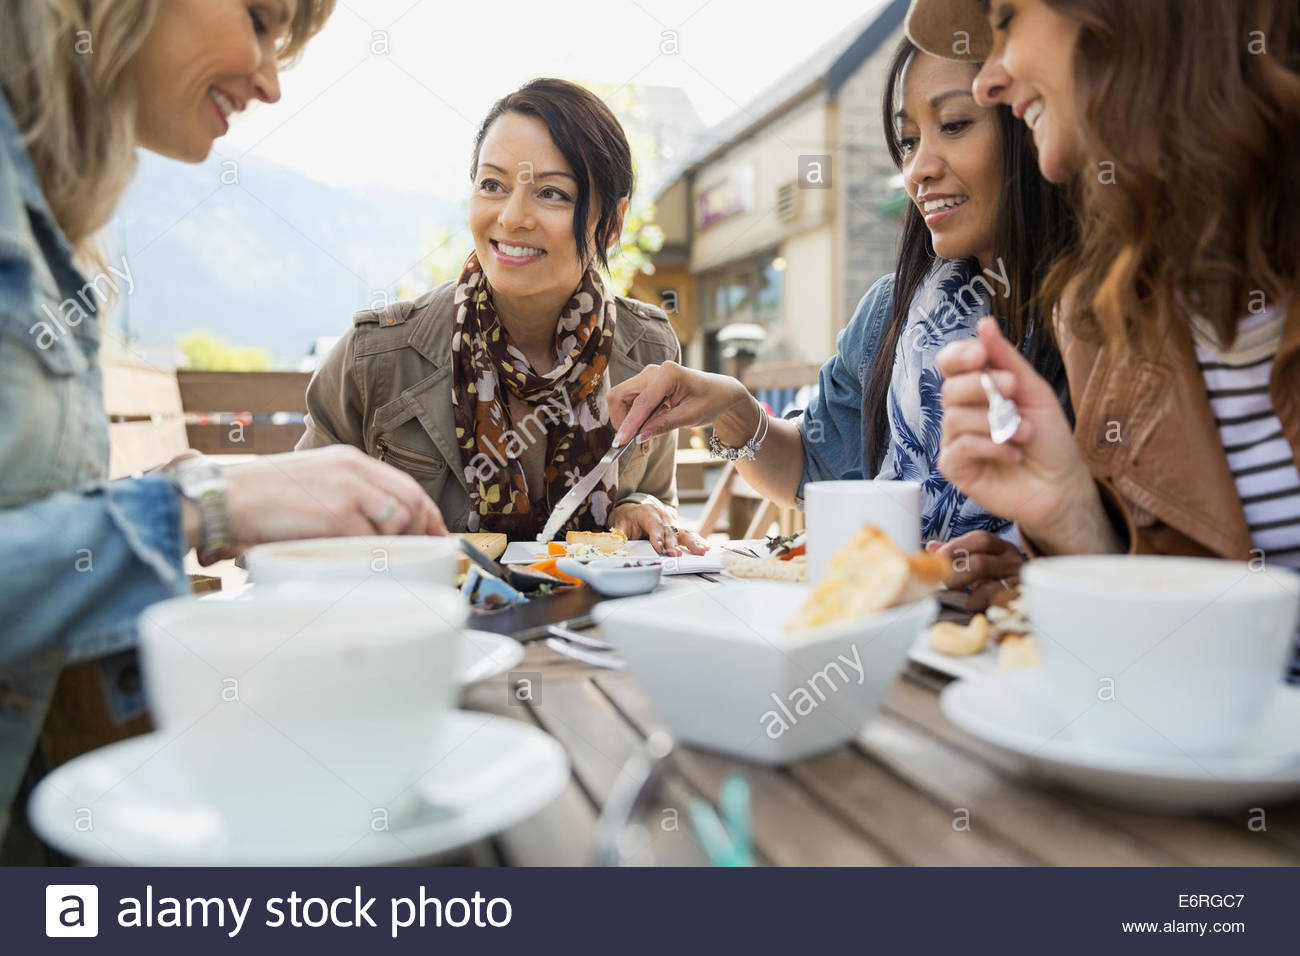 Le donne mangiare insieme al cafe Immagini Stock